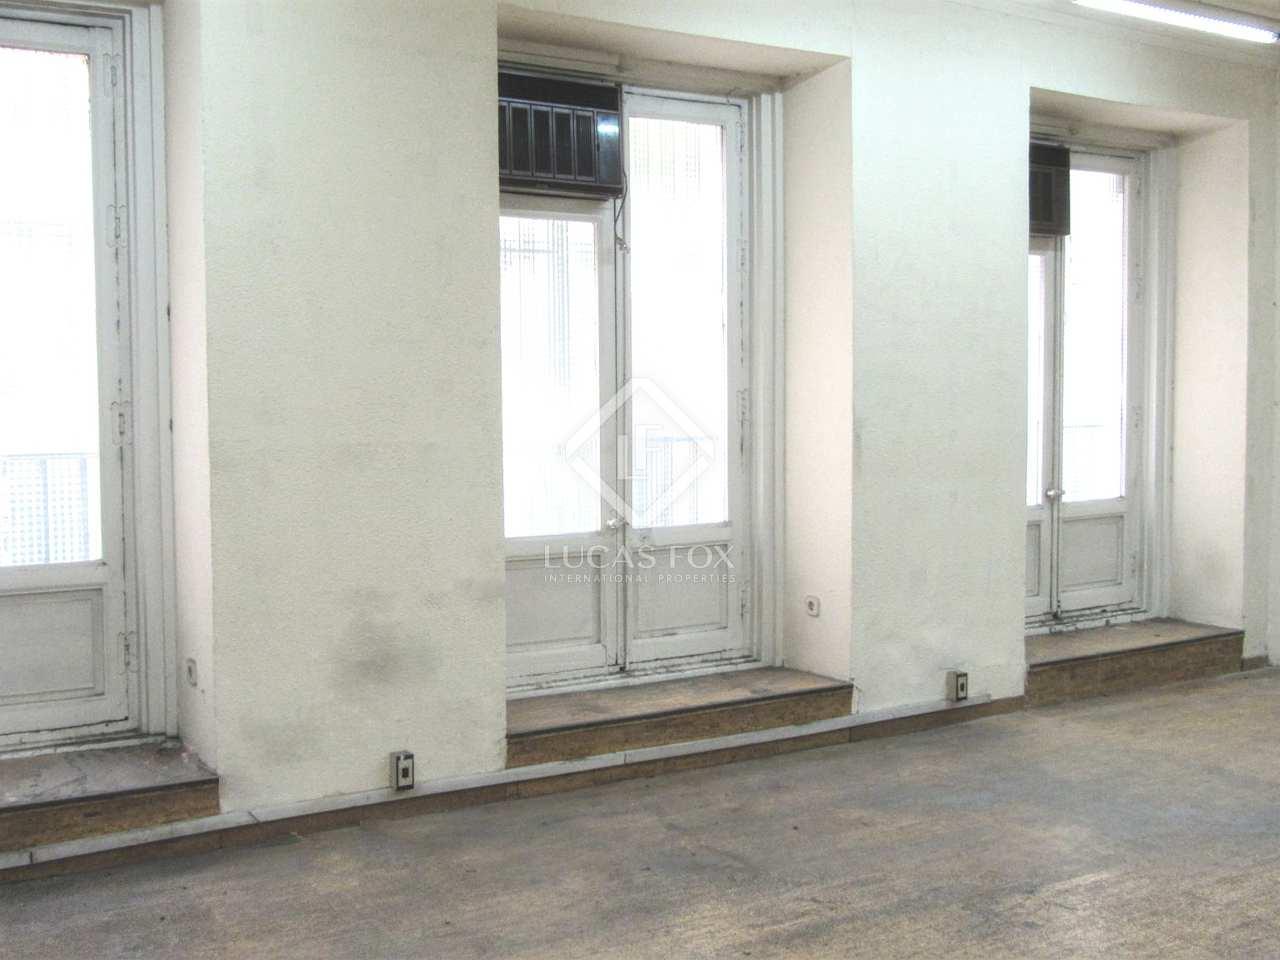 Apartments For Sale Chueca Madrid